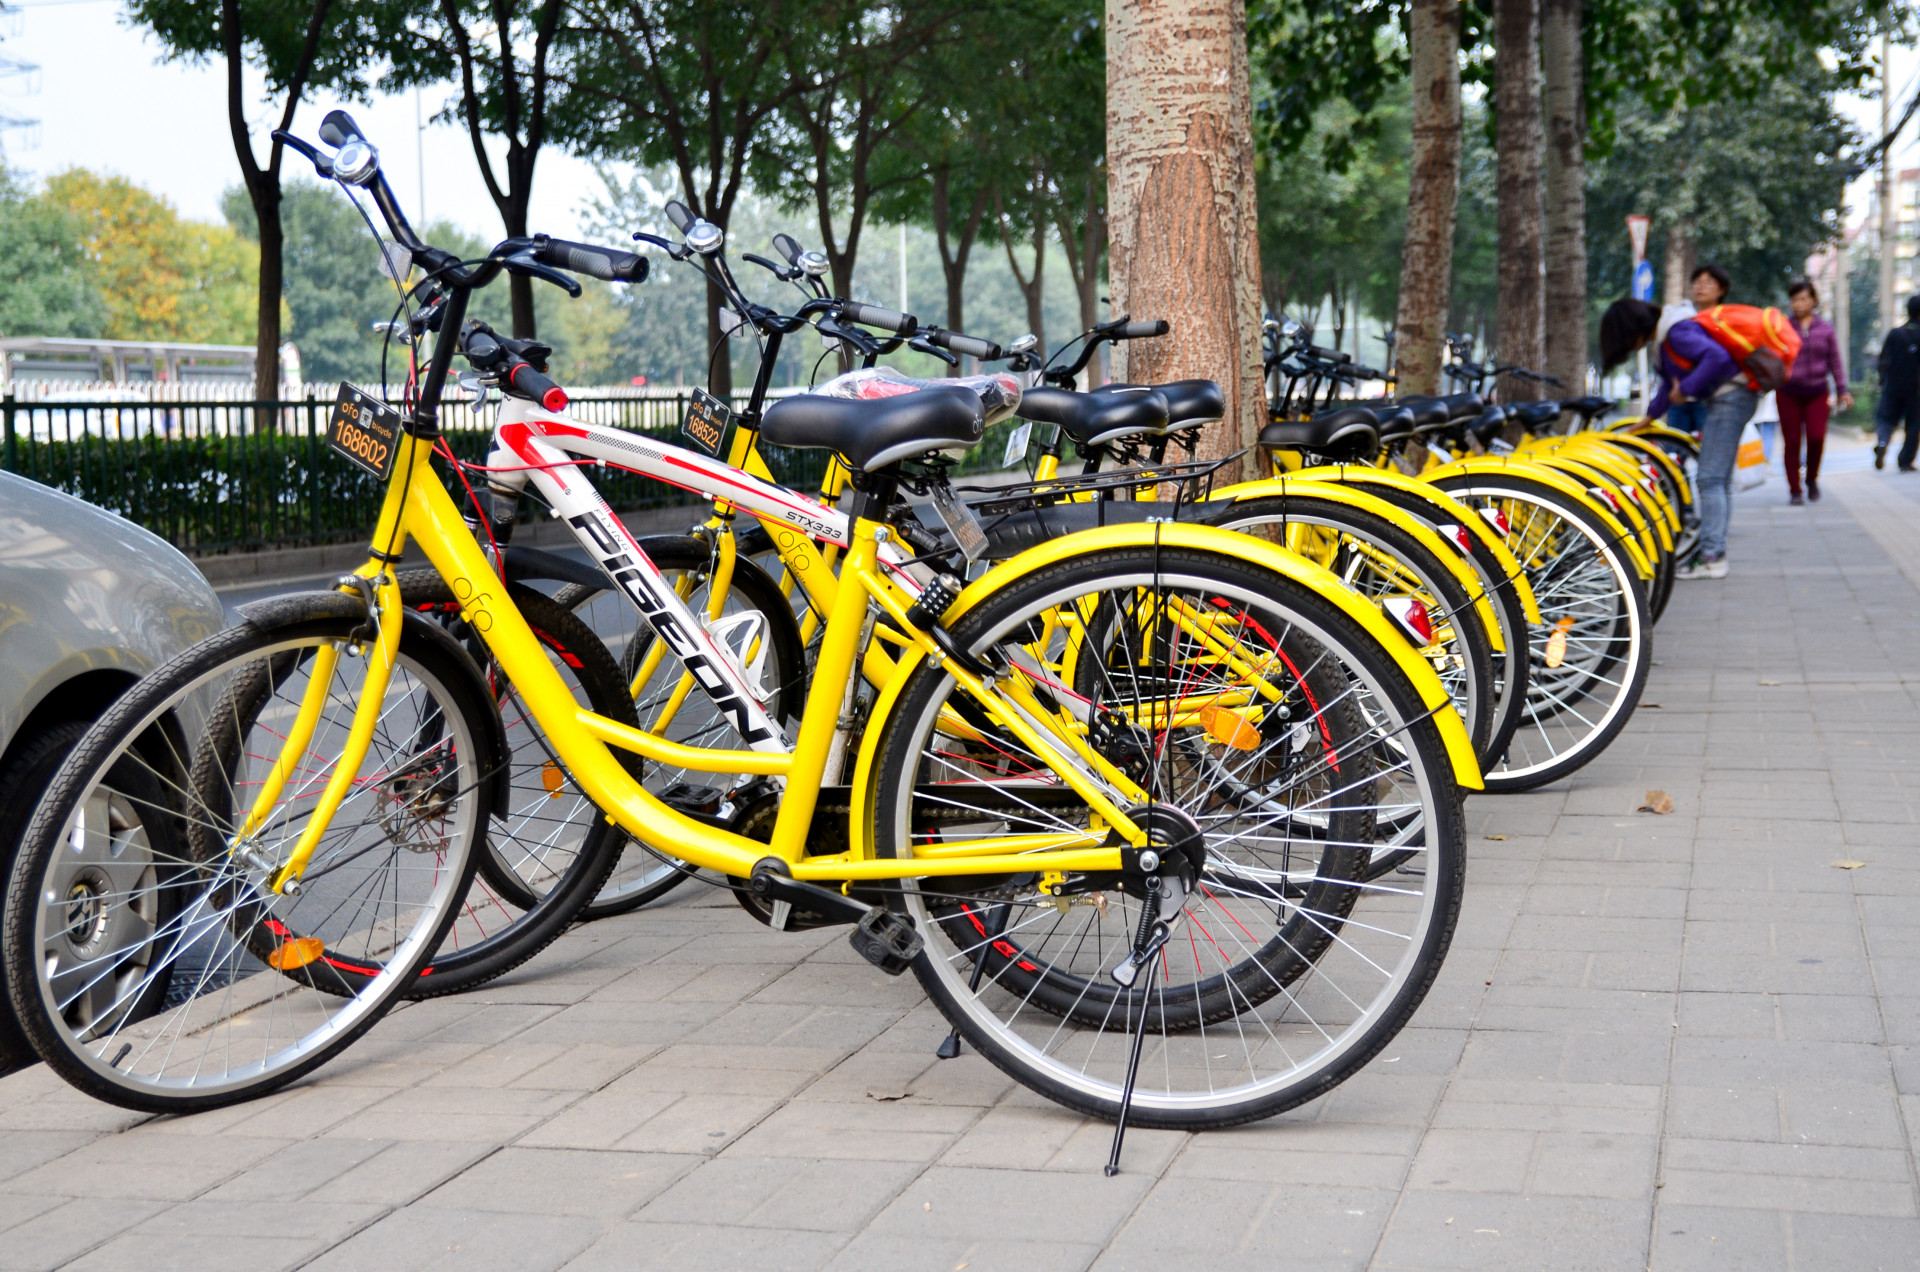 64126133_xxl ofo says its refund system still works despite increased processing times rental economy Ofo News Mobility bike-rental